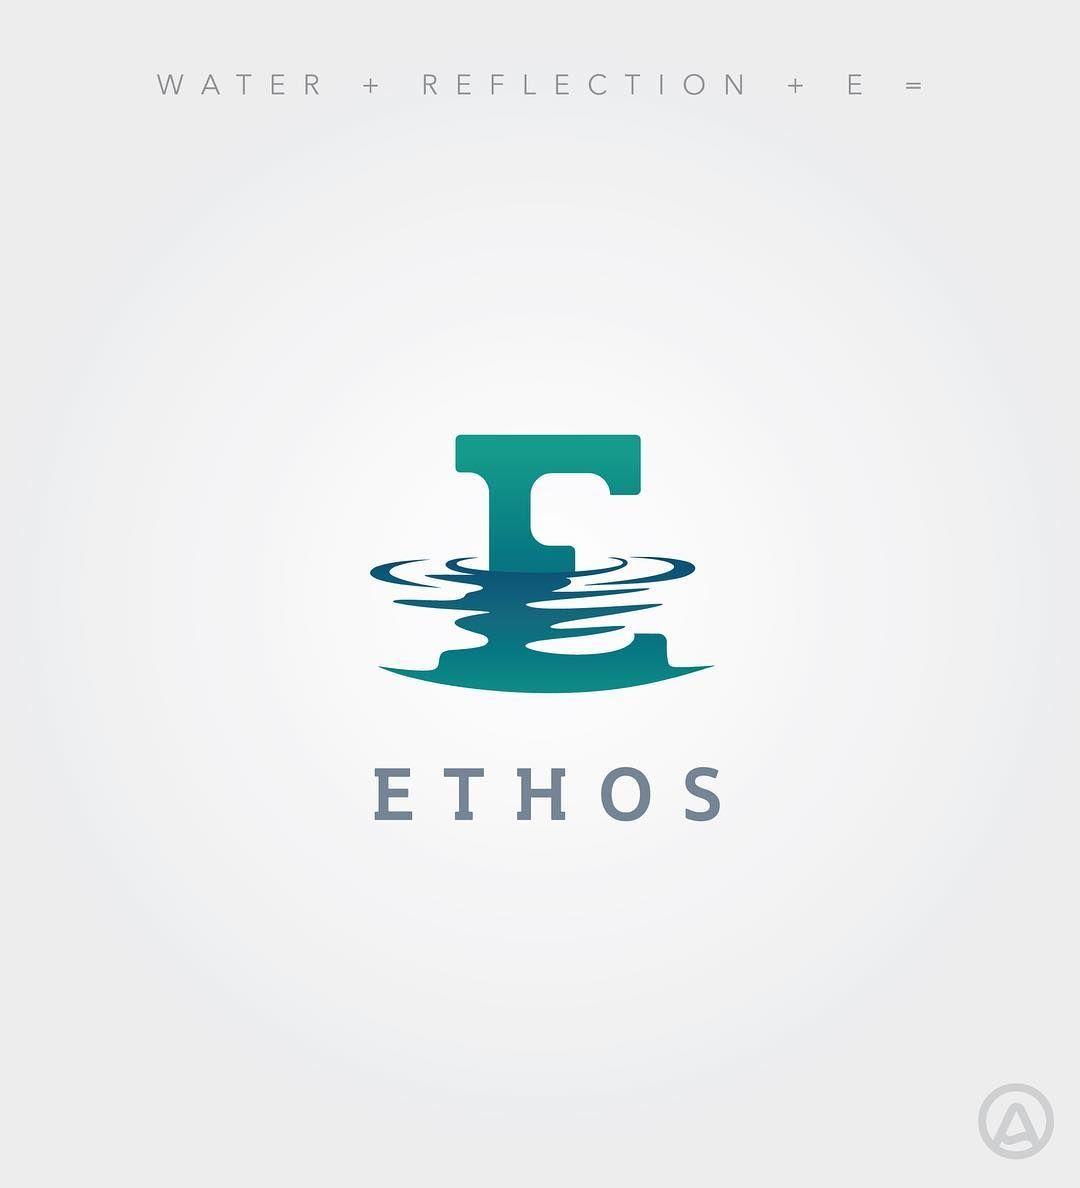 Ethos logo more organic feel to water reflection. #logo.